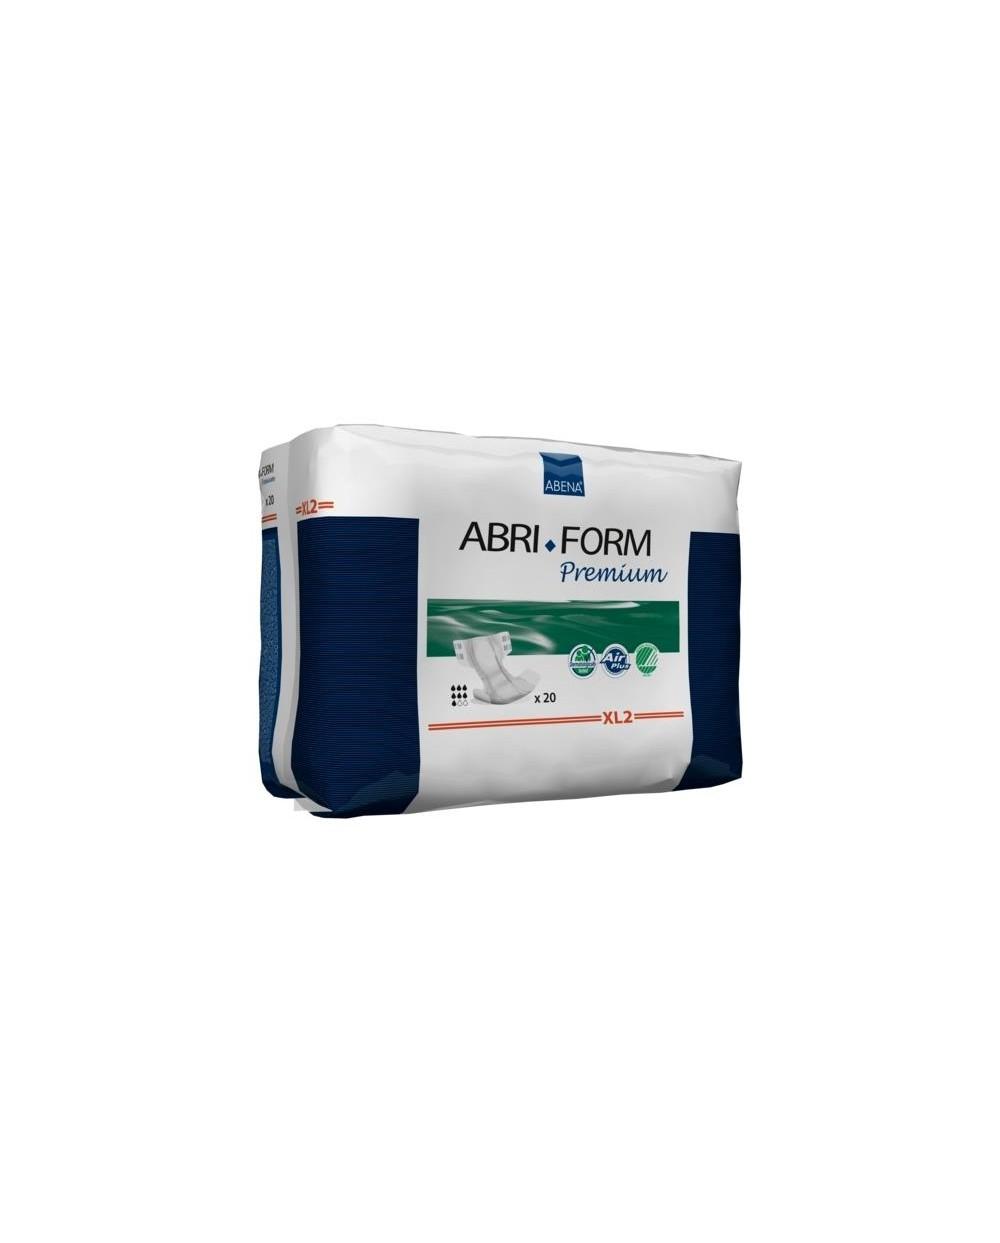 Abena Abri-Form 2 XL - 20 protections